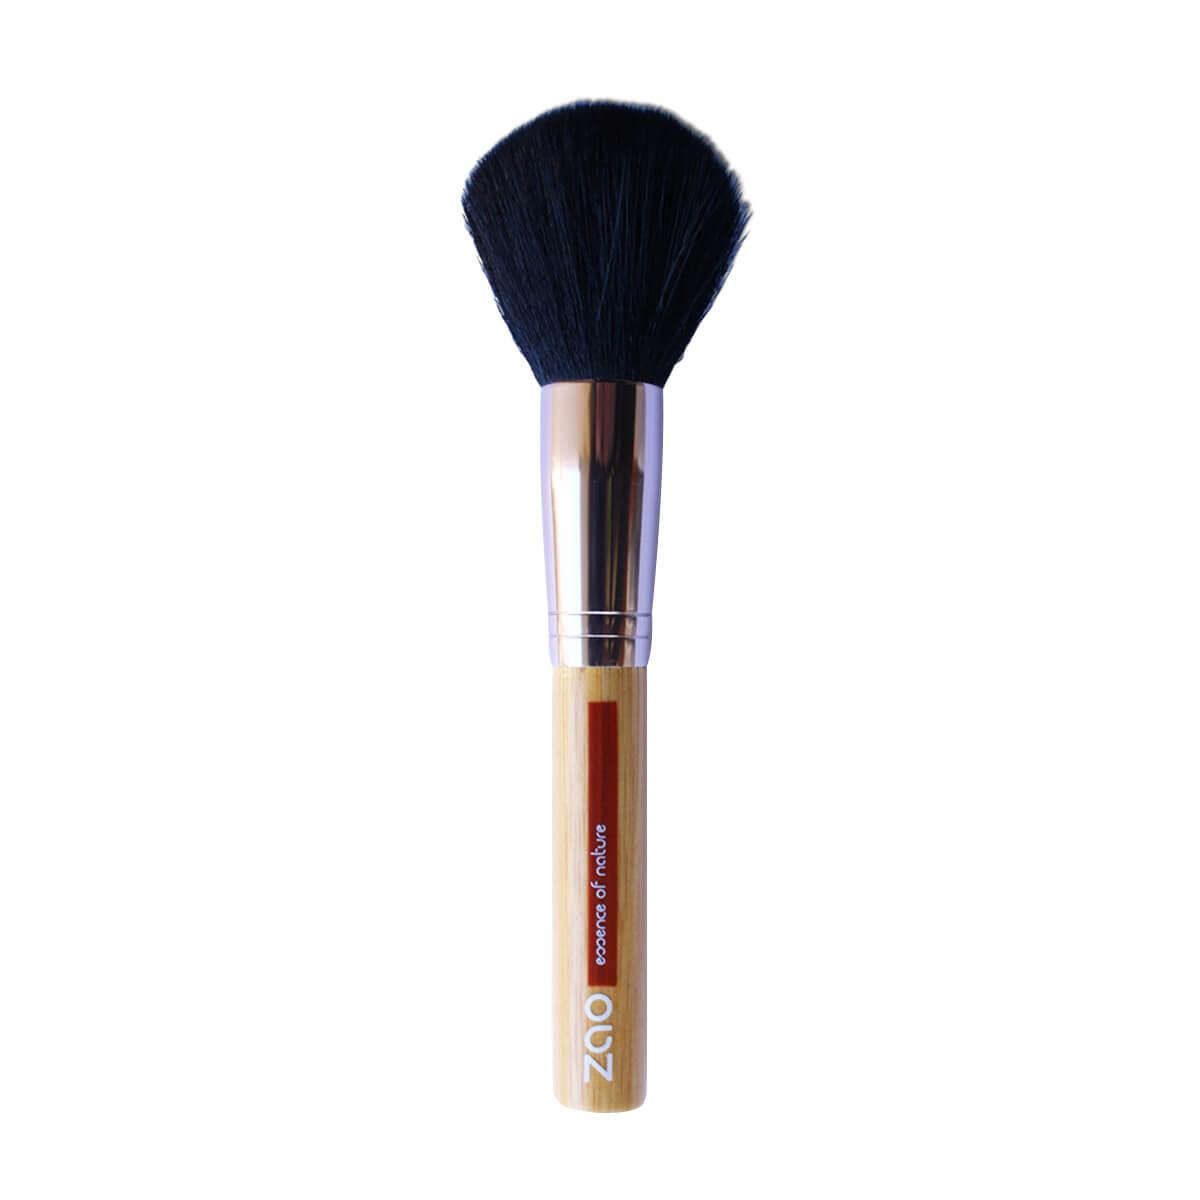 Bamboo Face Powder Brush